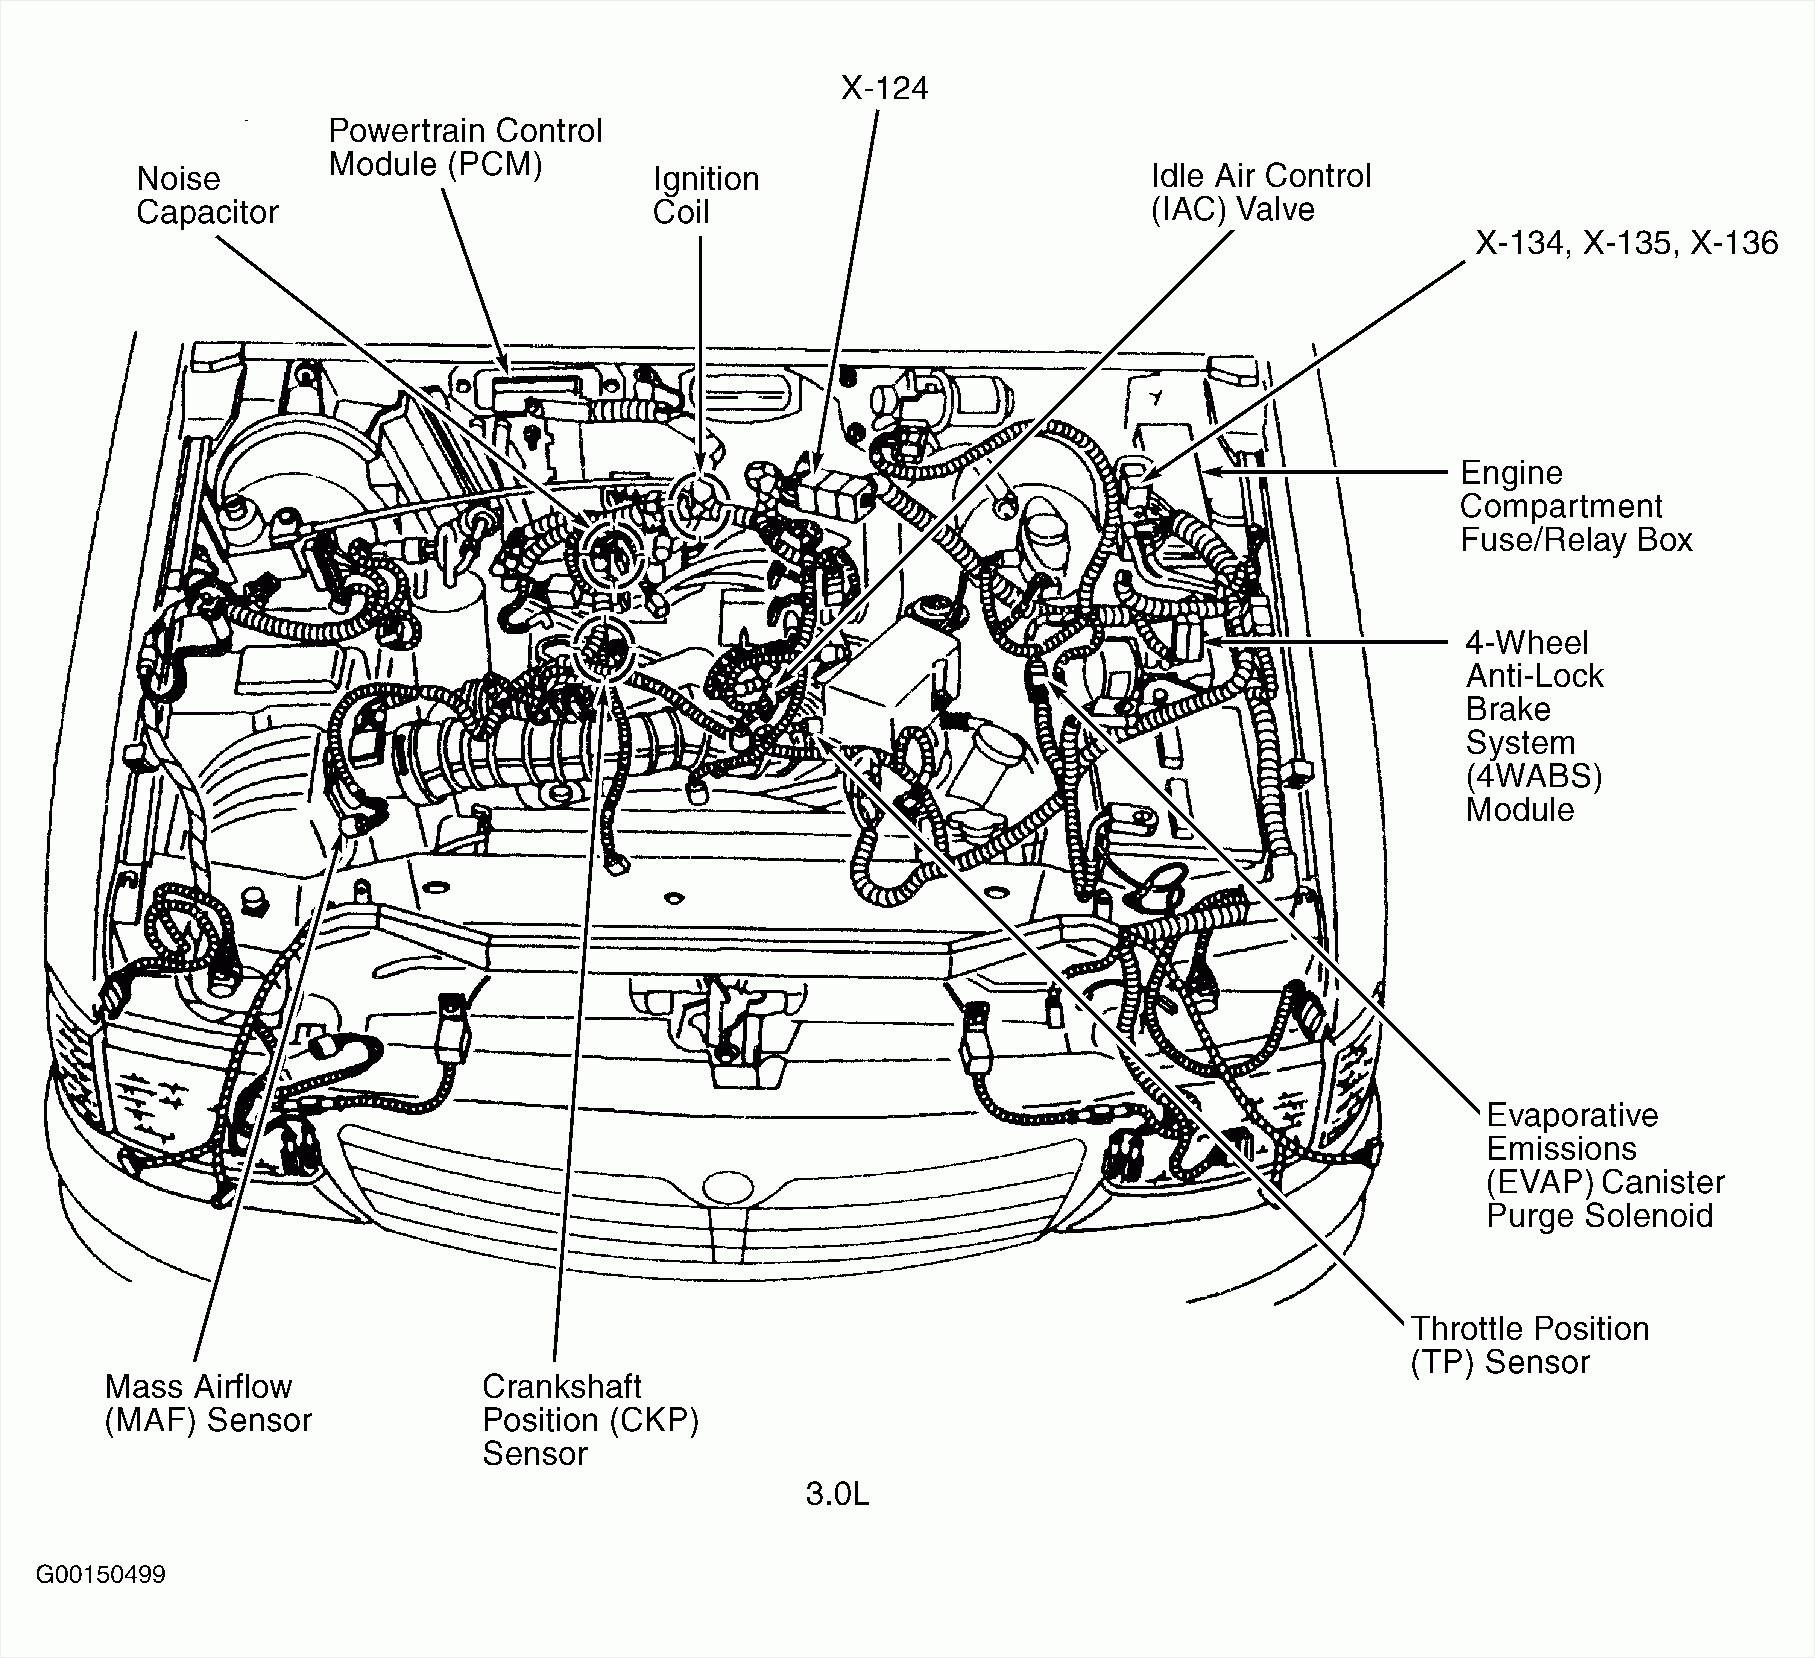 Volvo S40 Engine Diagram - Fg.davidforlife.de • on volvo engine schematics, 1998 volvo s70 vacuum hose diagram, audi s6 engine diagram, volvo 760 engine diagram, audi quattro engine diagram, volvo fuse diagram, v70 engine diagram, volvo s70 t5 engine diagram, bmw m3 engine diagram, chrysler town & country engine diagram, porsche cayenne engine diagram, volvo 164 engine diagram, mercedes benz ml engine diagram, volvo 240 rear suspension diagram, maserati quattroporte engine diagram, mini countryman engine diagram, volvo v40 engine diagram, mercedes c300 engine diagram, chevrolet cruze engine diagram, volvo parts diagram,